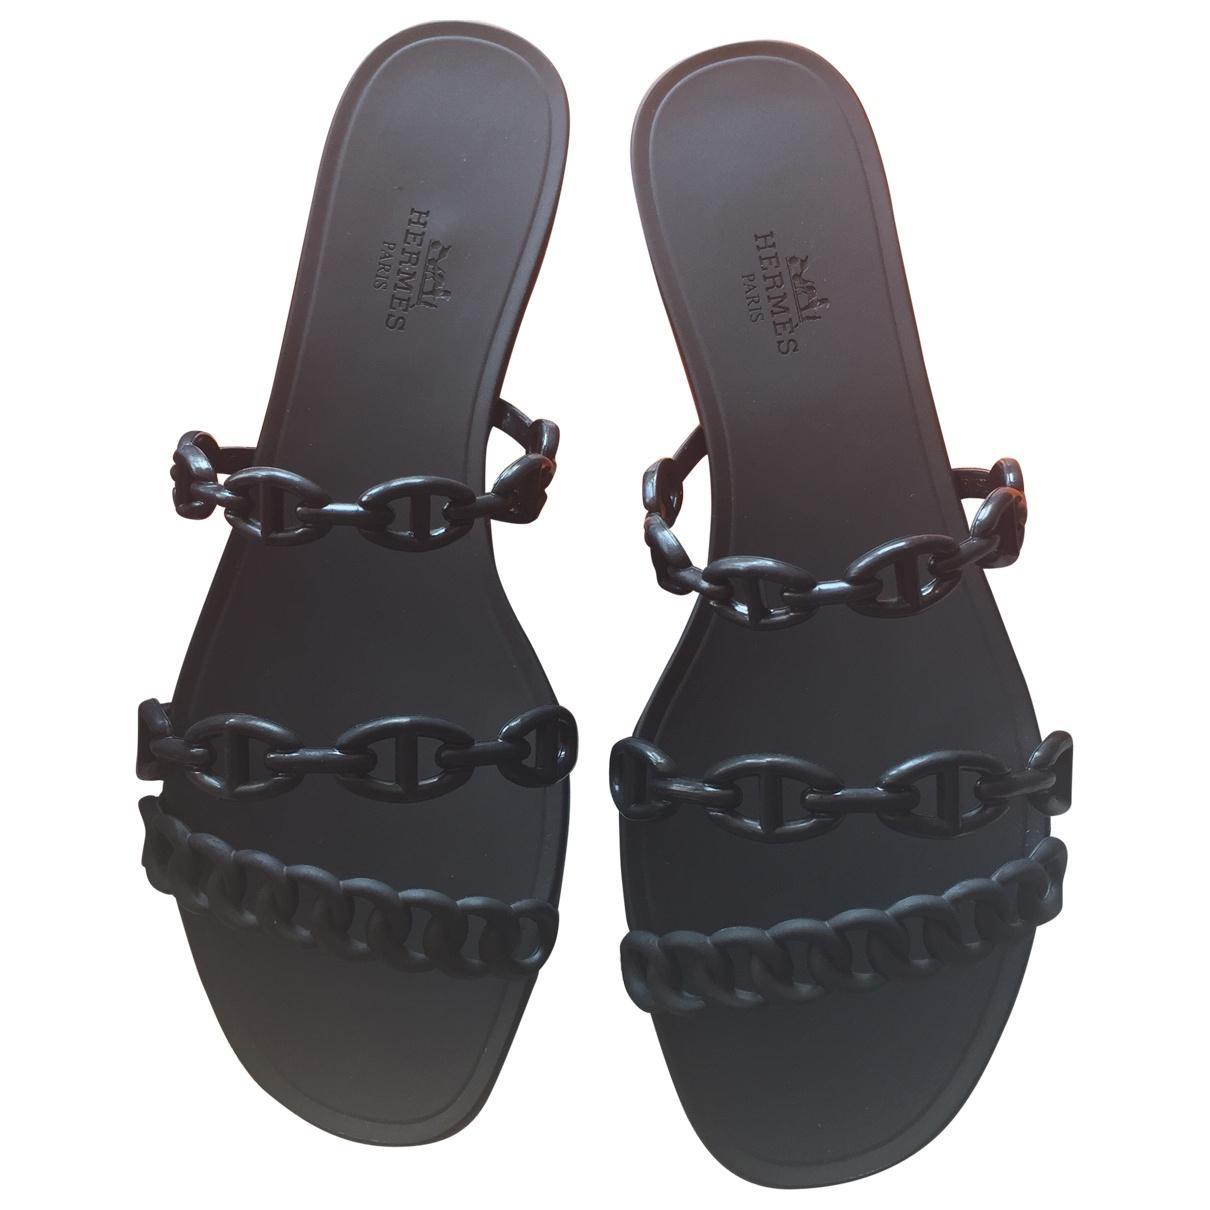 dd1143c13490 Hermès. Women s Nude Black Rubber Sandals.  508  452 From Vestiaire  Collective